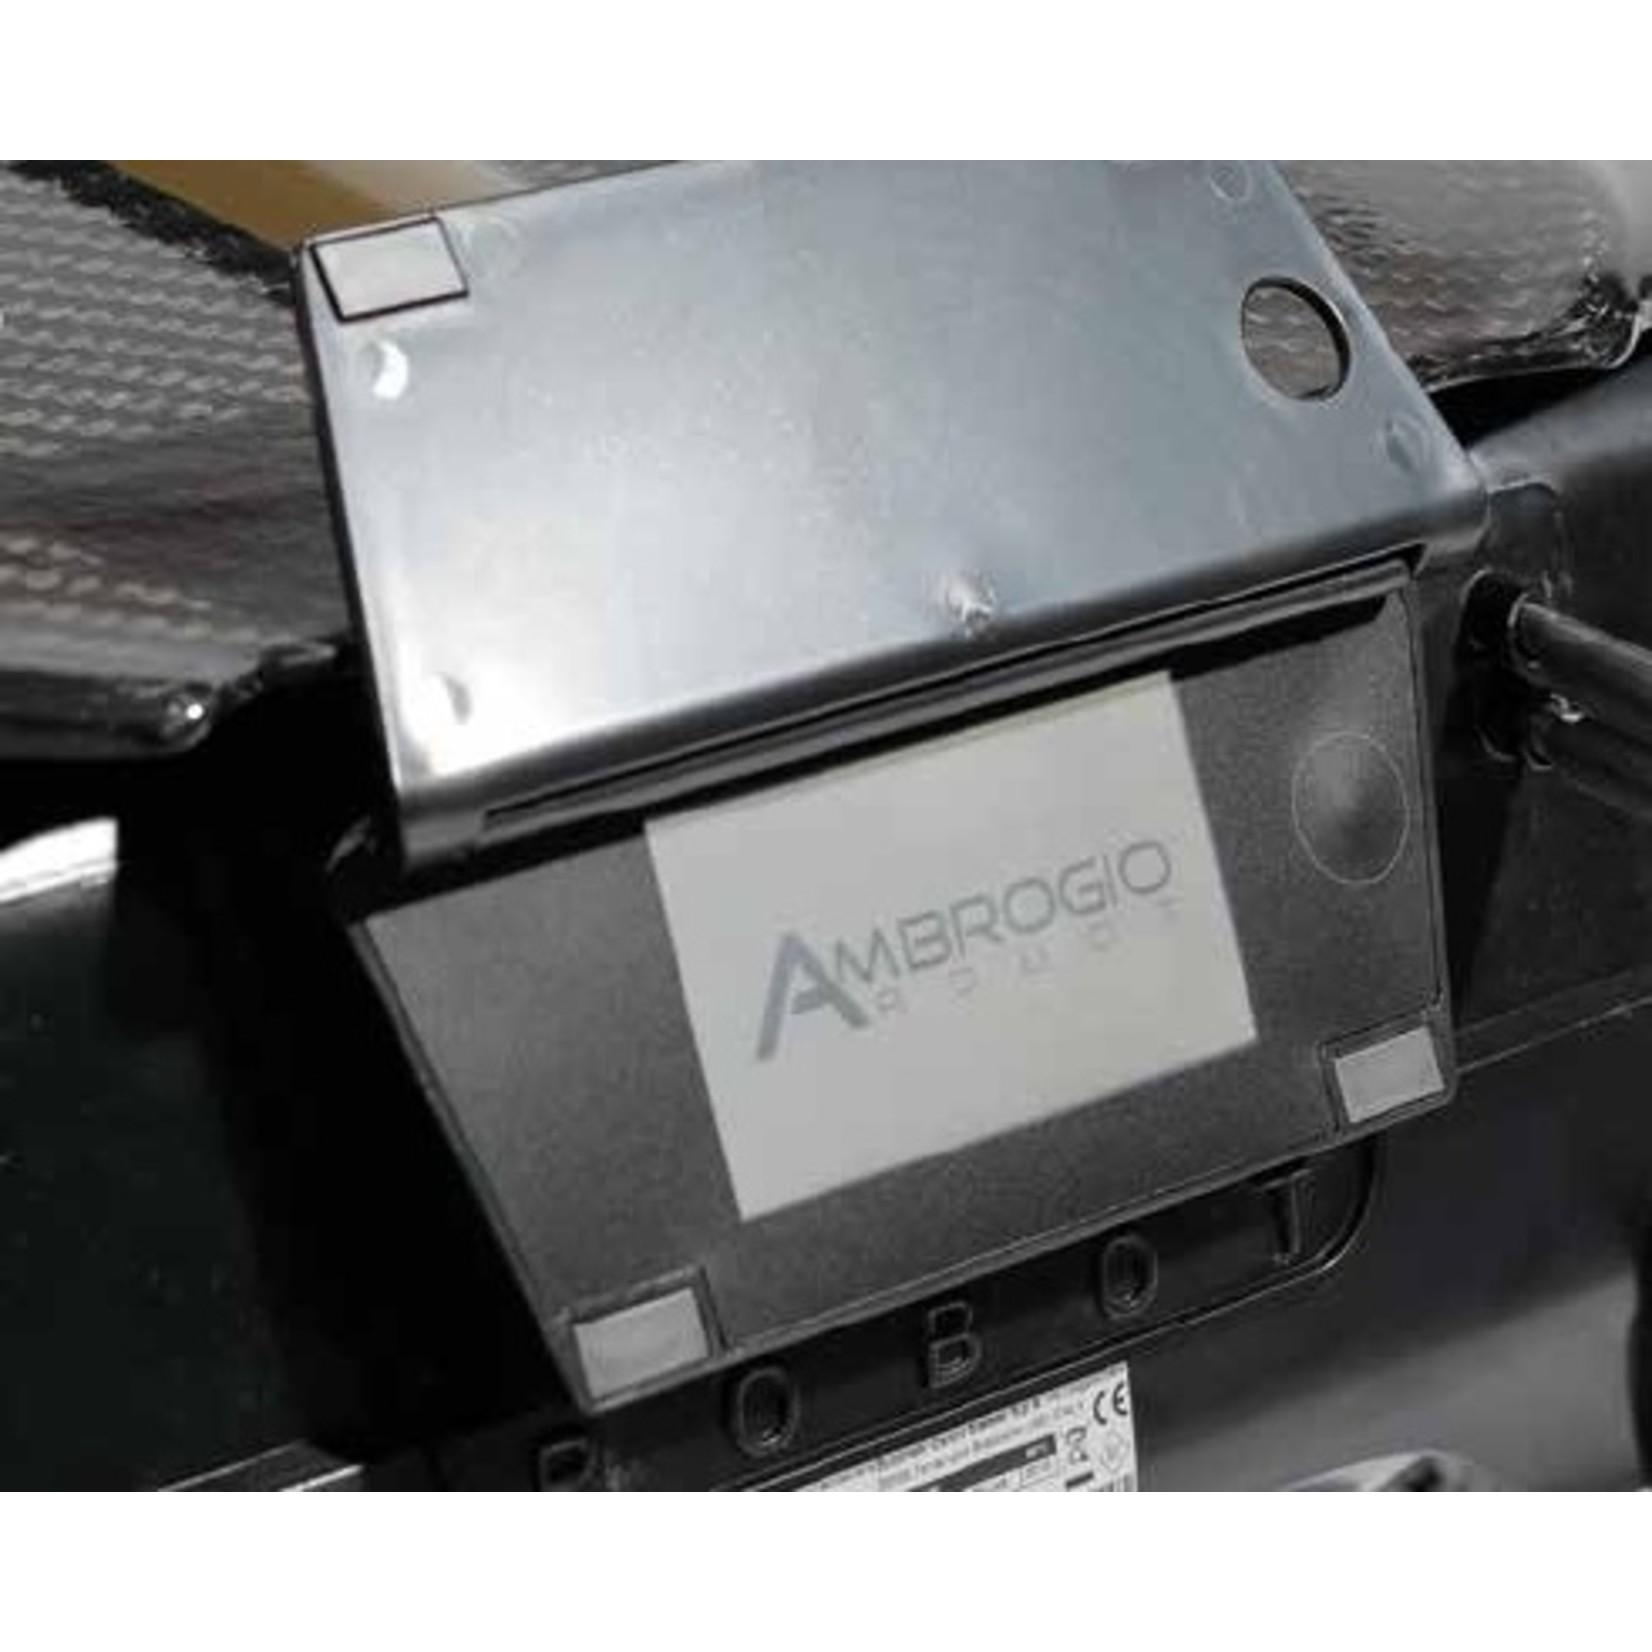 Ambrogio Ambrogio Proline L400i Deluxe Rasenmähroboter Modell 2021